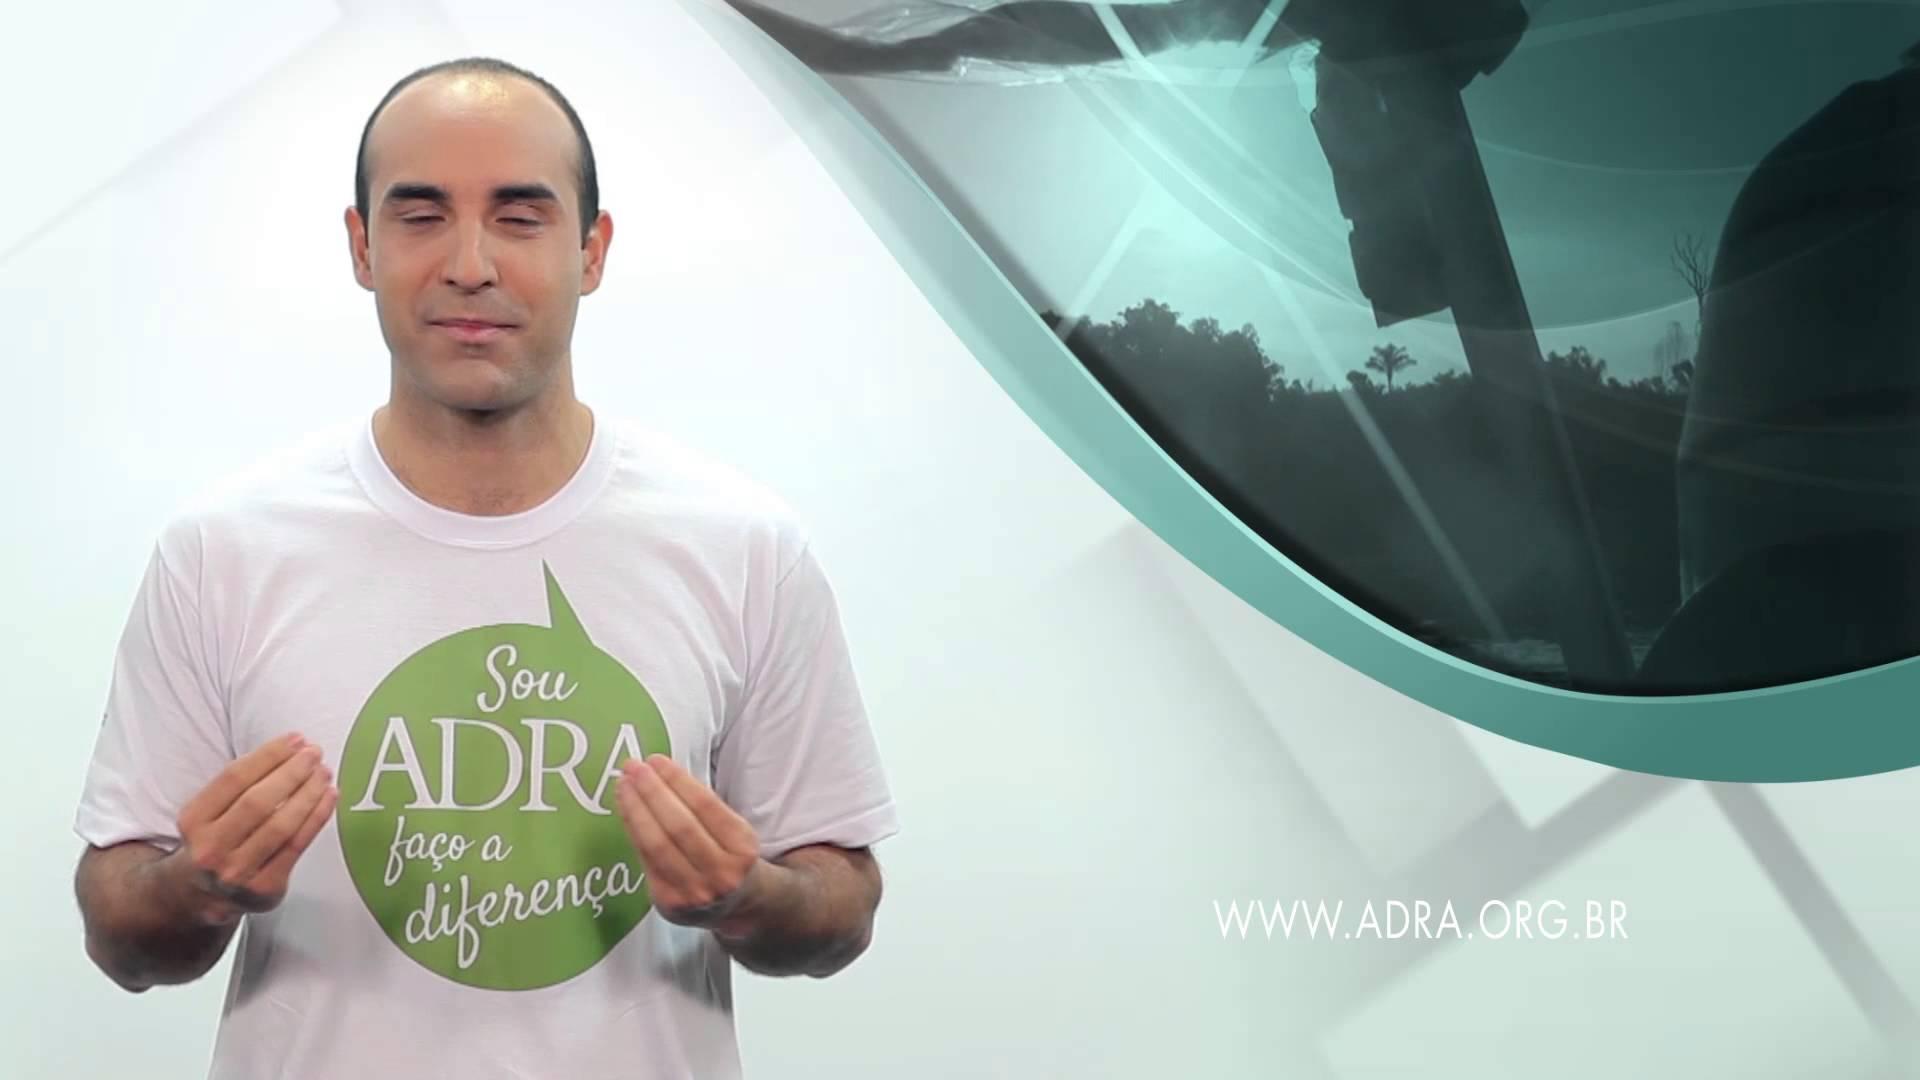 Tiago Ramos – #souADRA